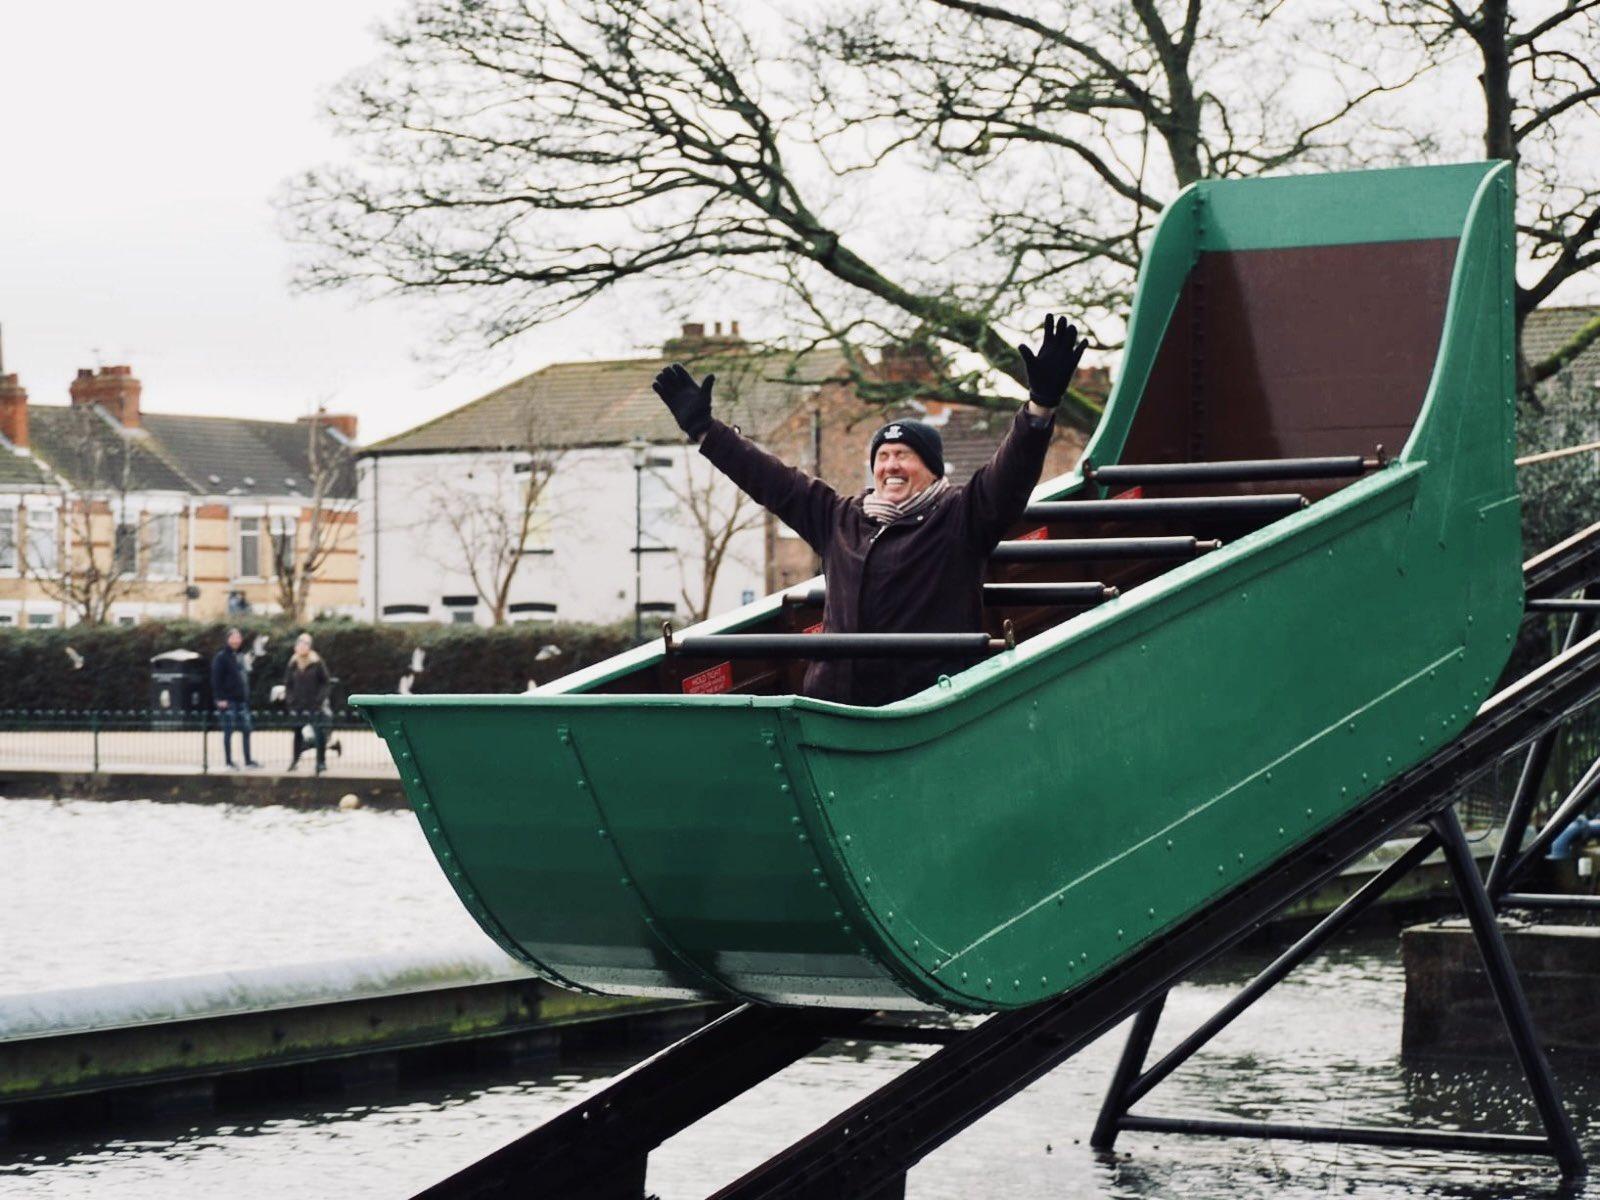 Historic splash boat returns to East Park